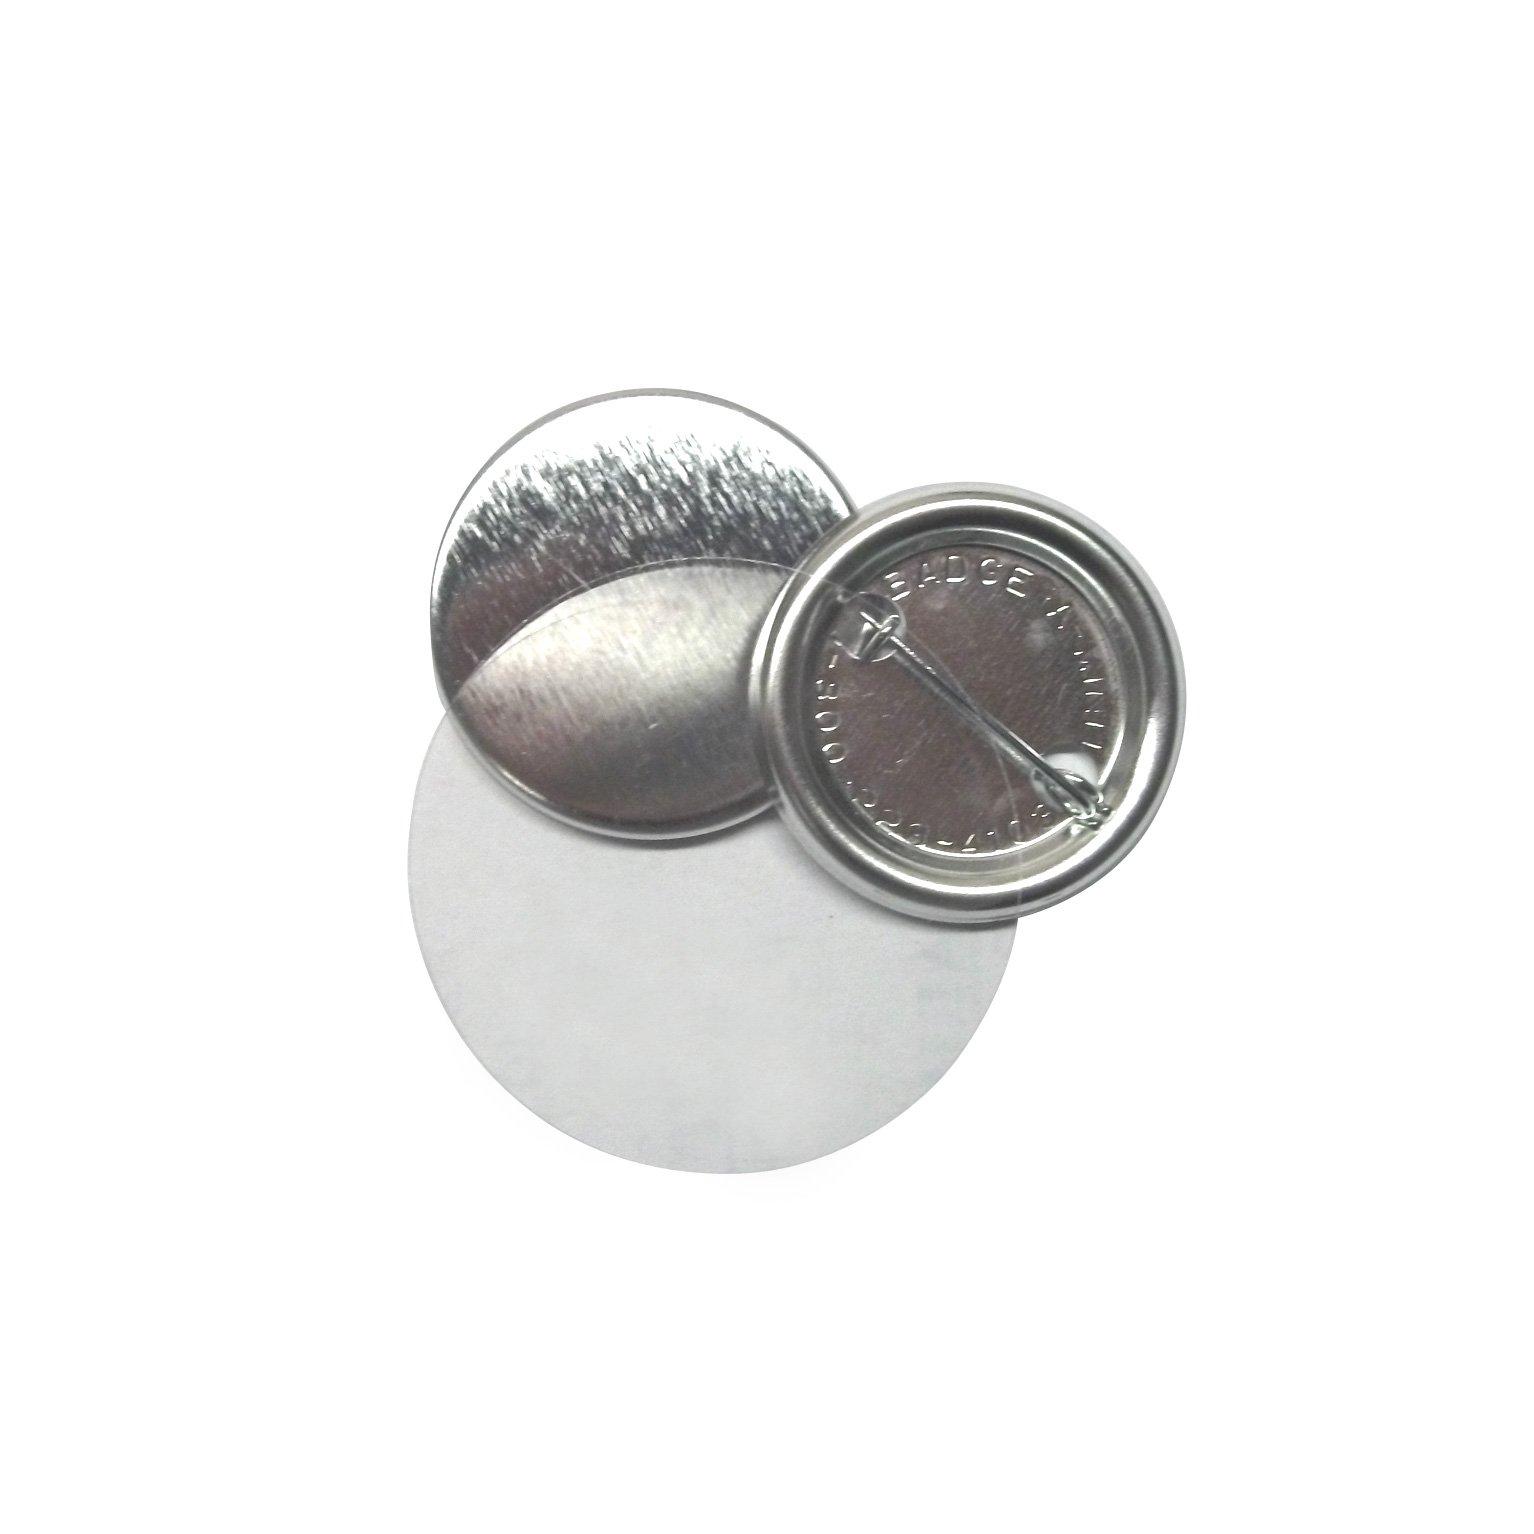 Badge-A-Minit 3061-E 1 1/4'' Genuine Badge-A-Minit Pin-Back Button Sets - 500 sets